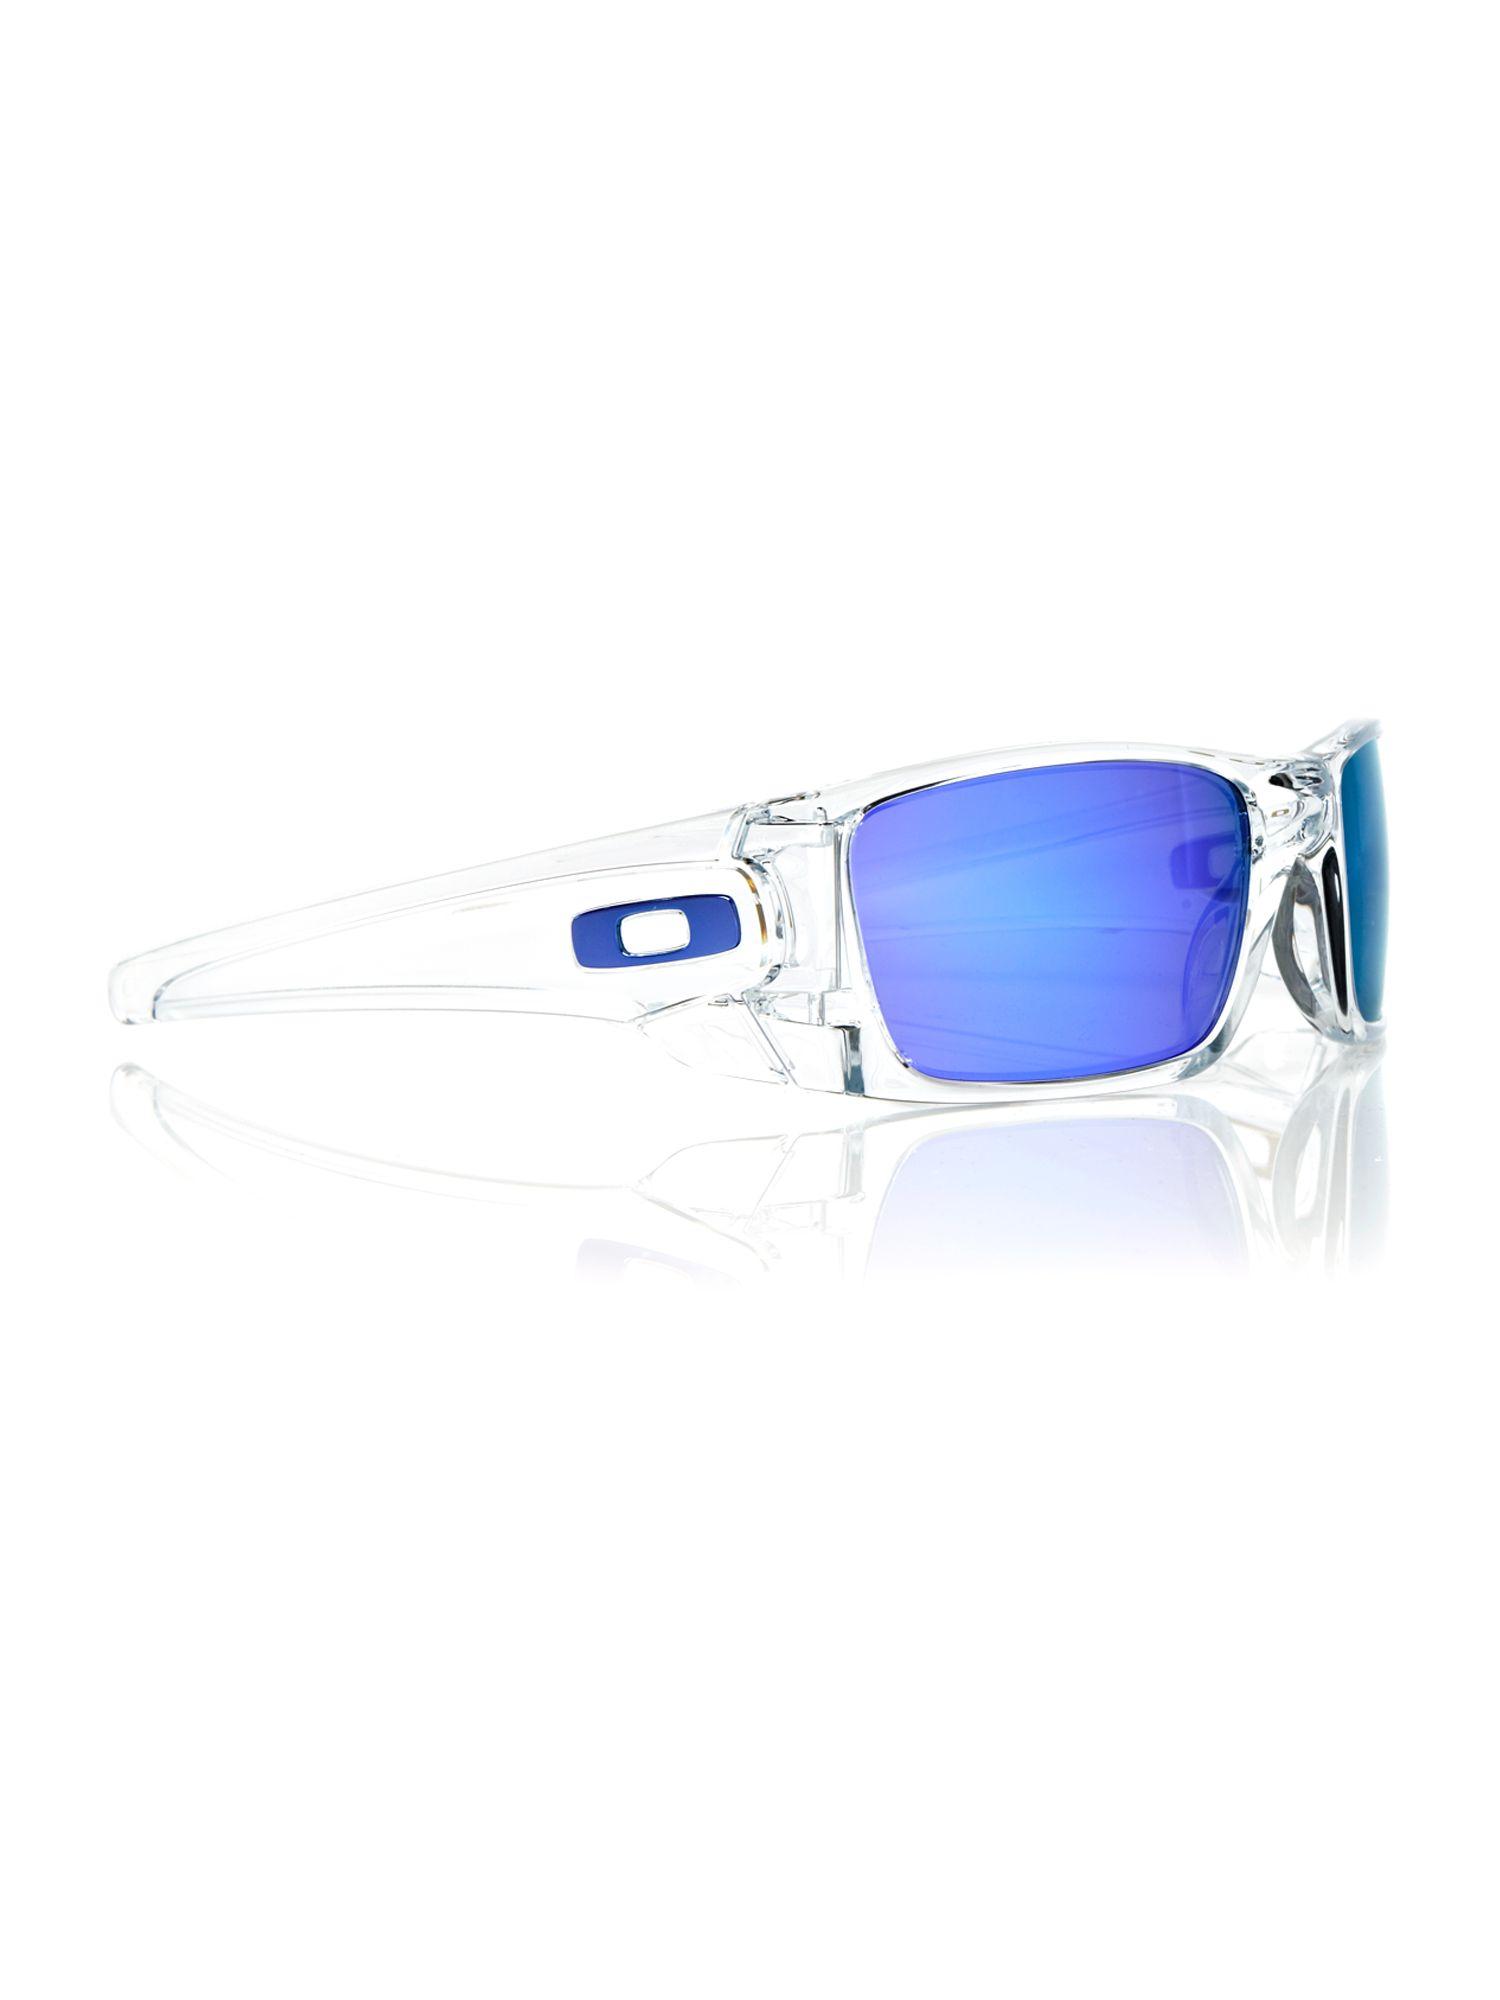 a952ac2f05f Oakley Fuel Cell Blue Frame Purple Lens Sunglasses